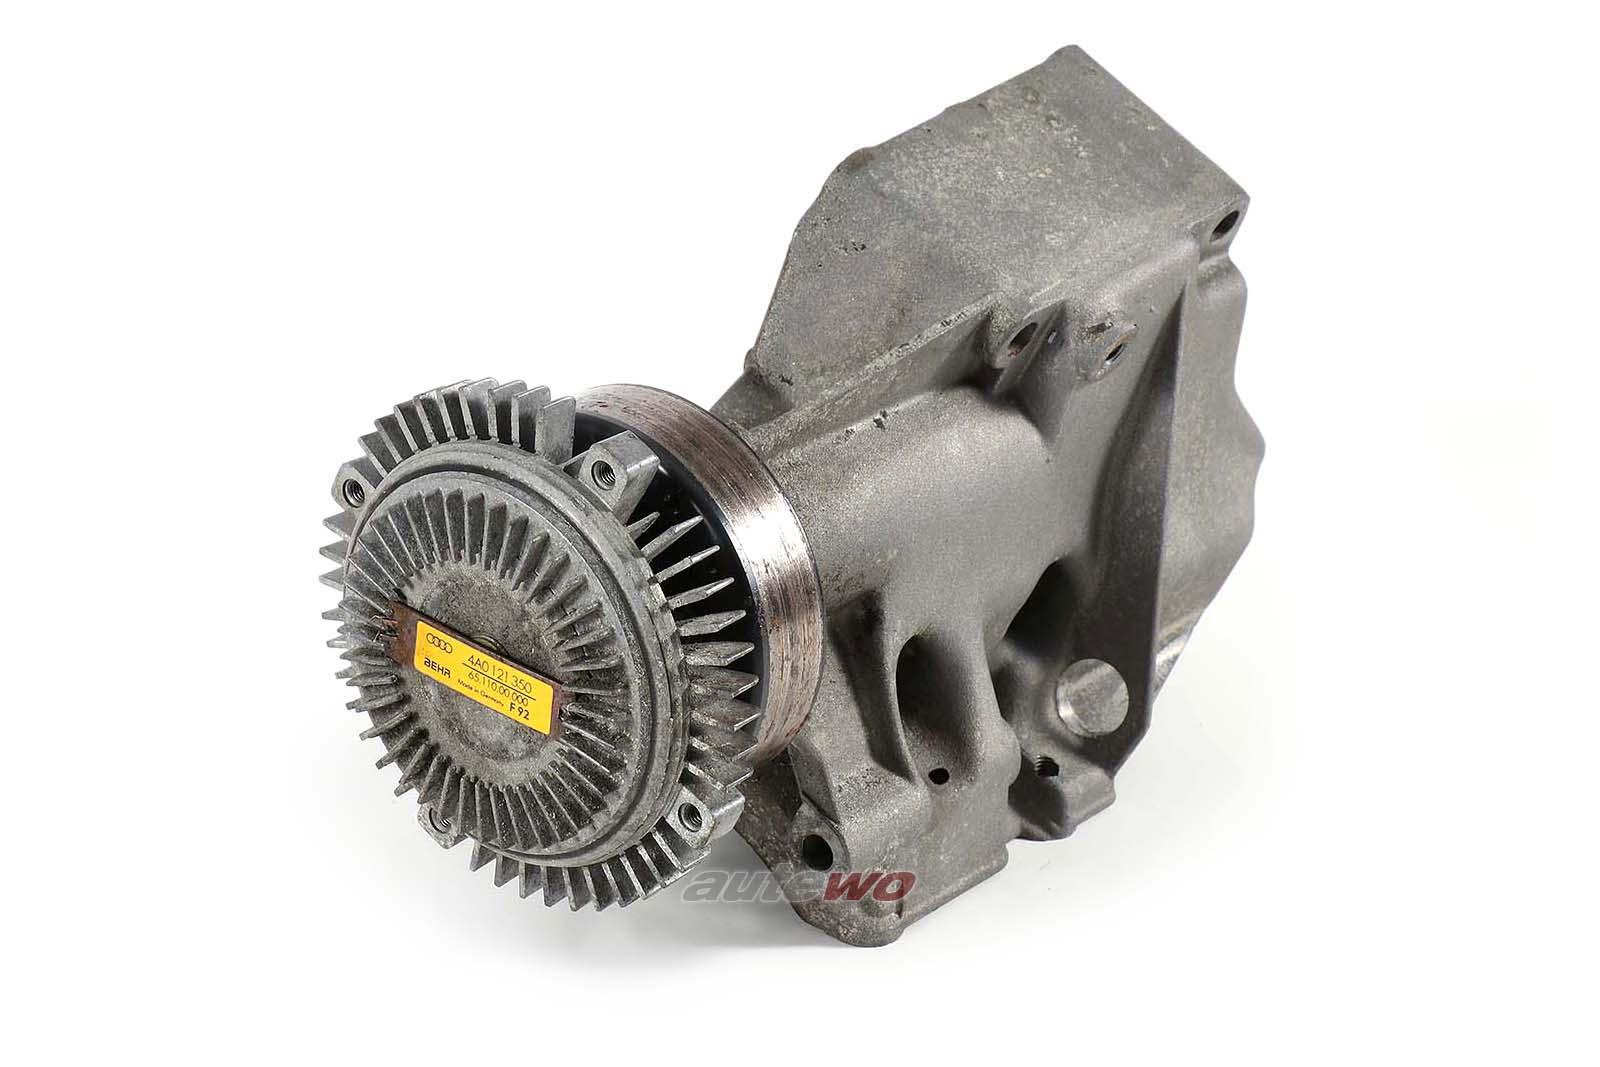 4A0121350 046903141D & 4A0121350B Audi 100/A6/S4/S6 C4 Halter Viskokupplung